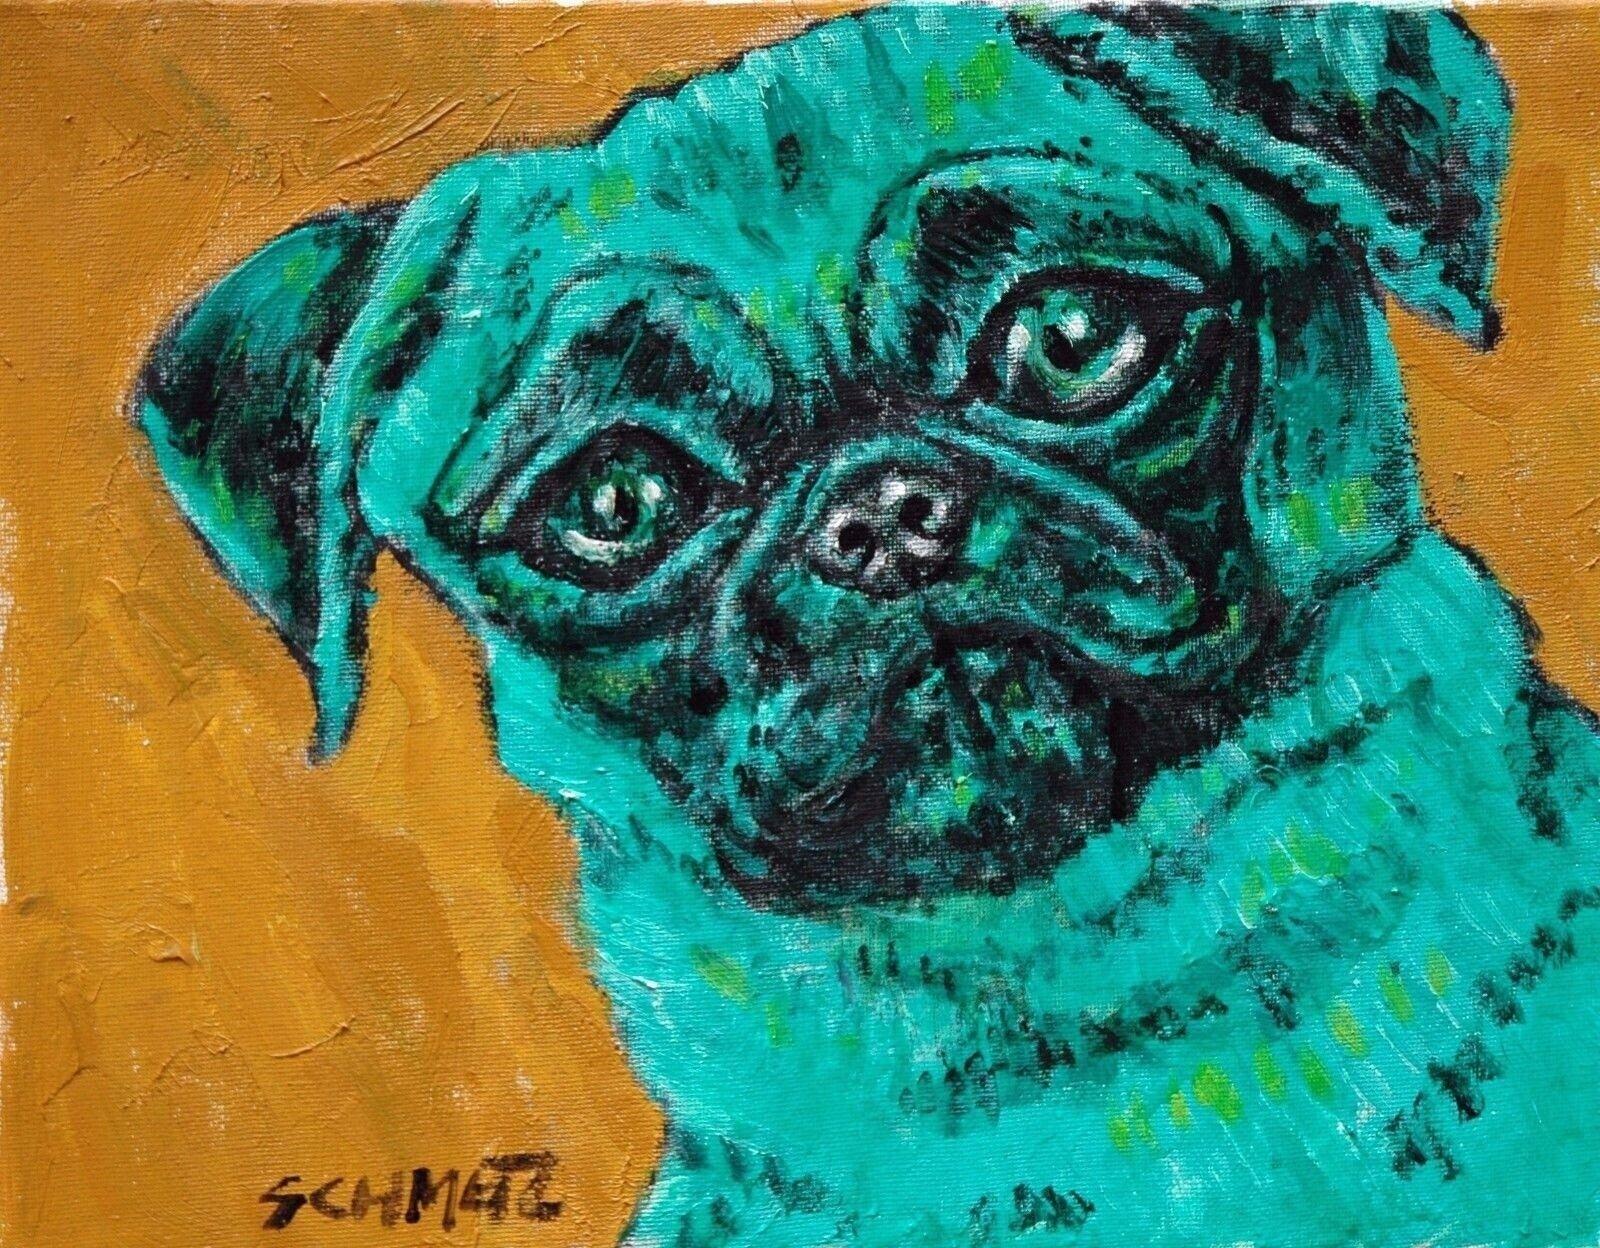 BLue French Bulldog Signed dog art PRINT 11x14 animals impressionism